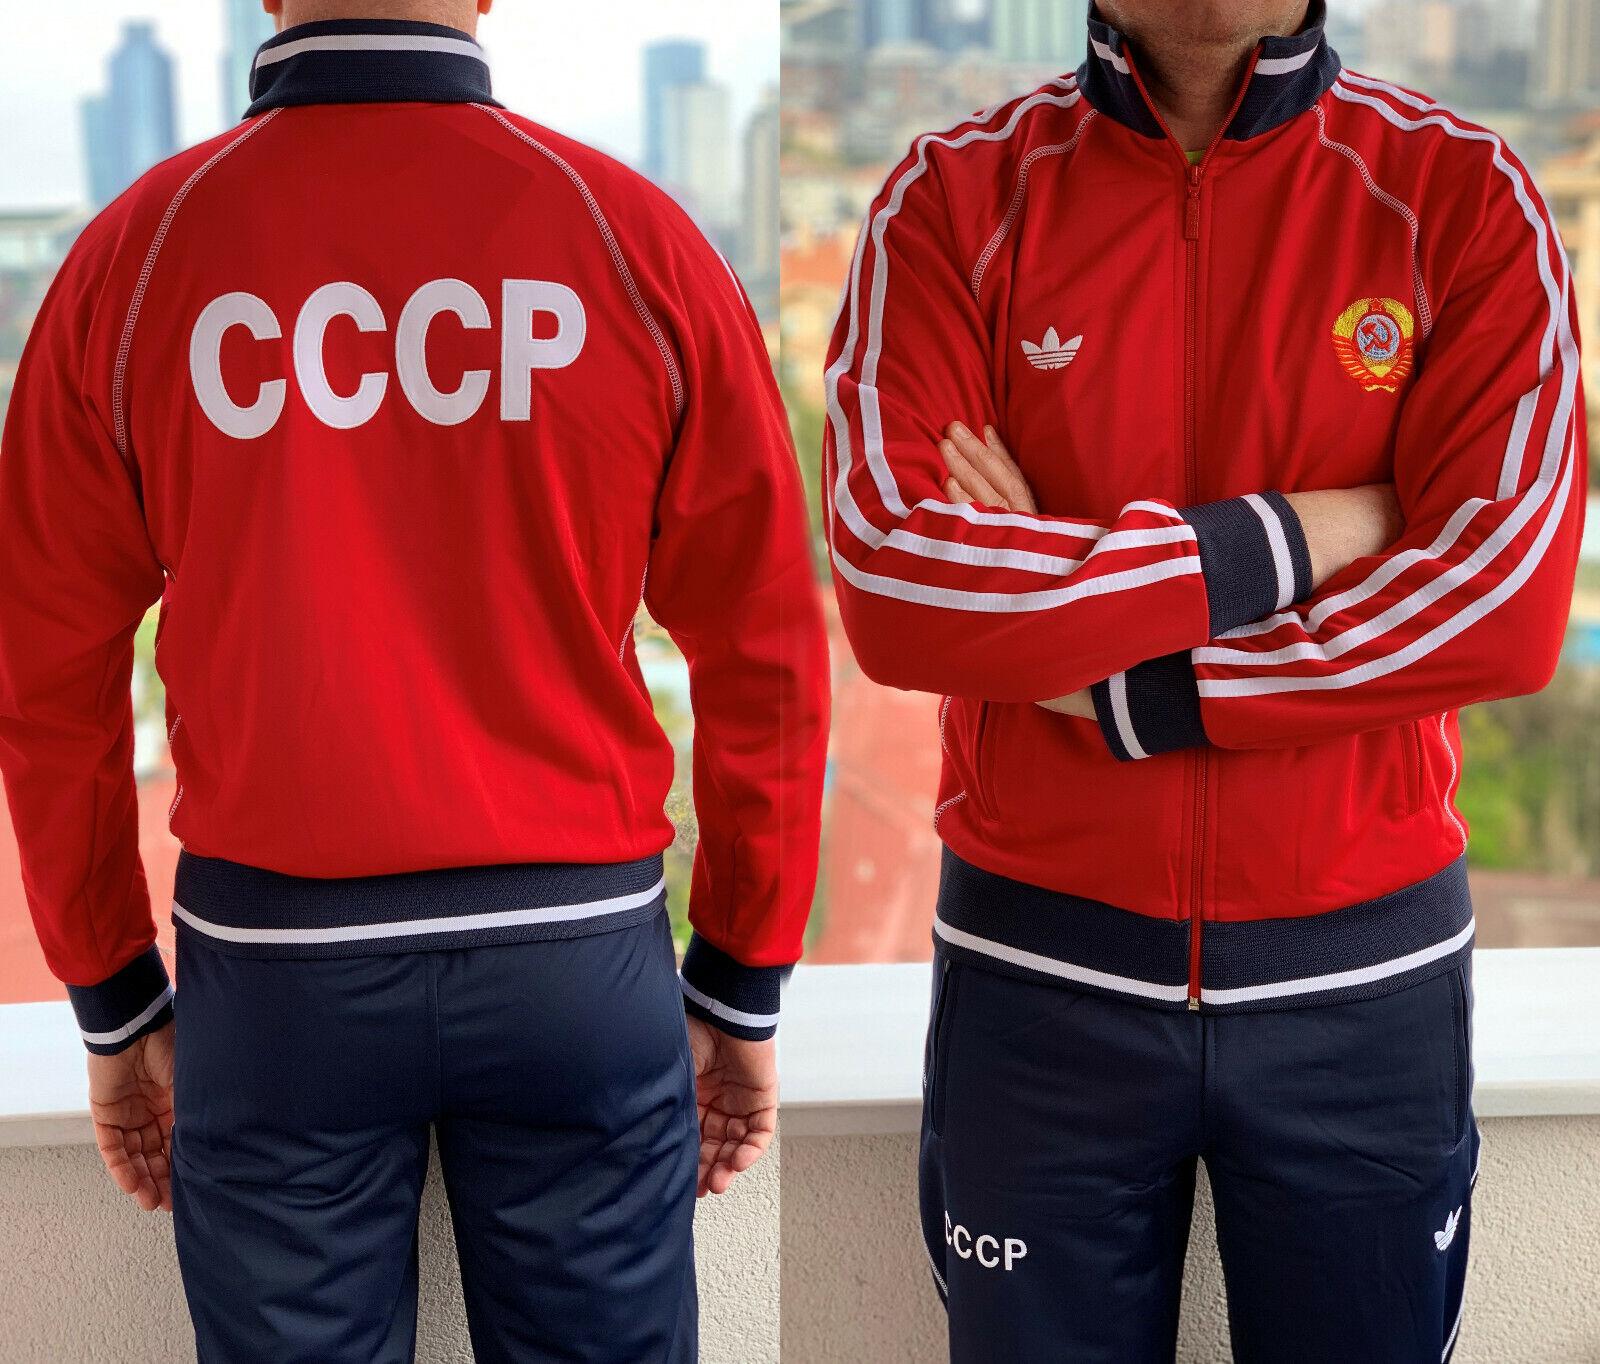 Rot Adidas Udssr Cccp Vintage Sowjet Union Russland